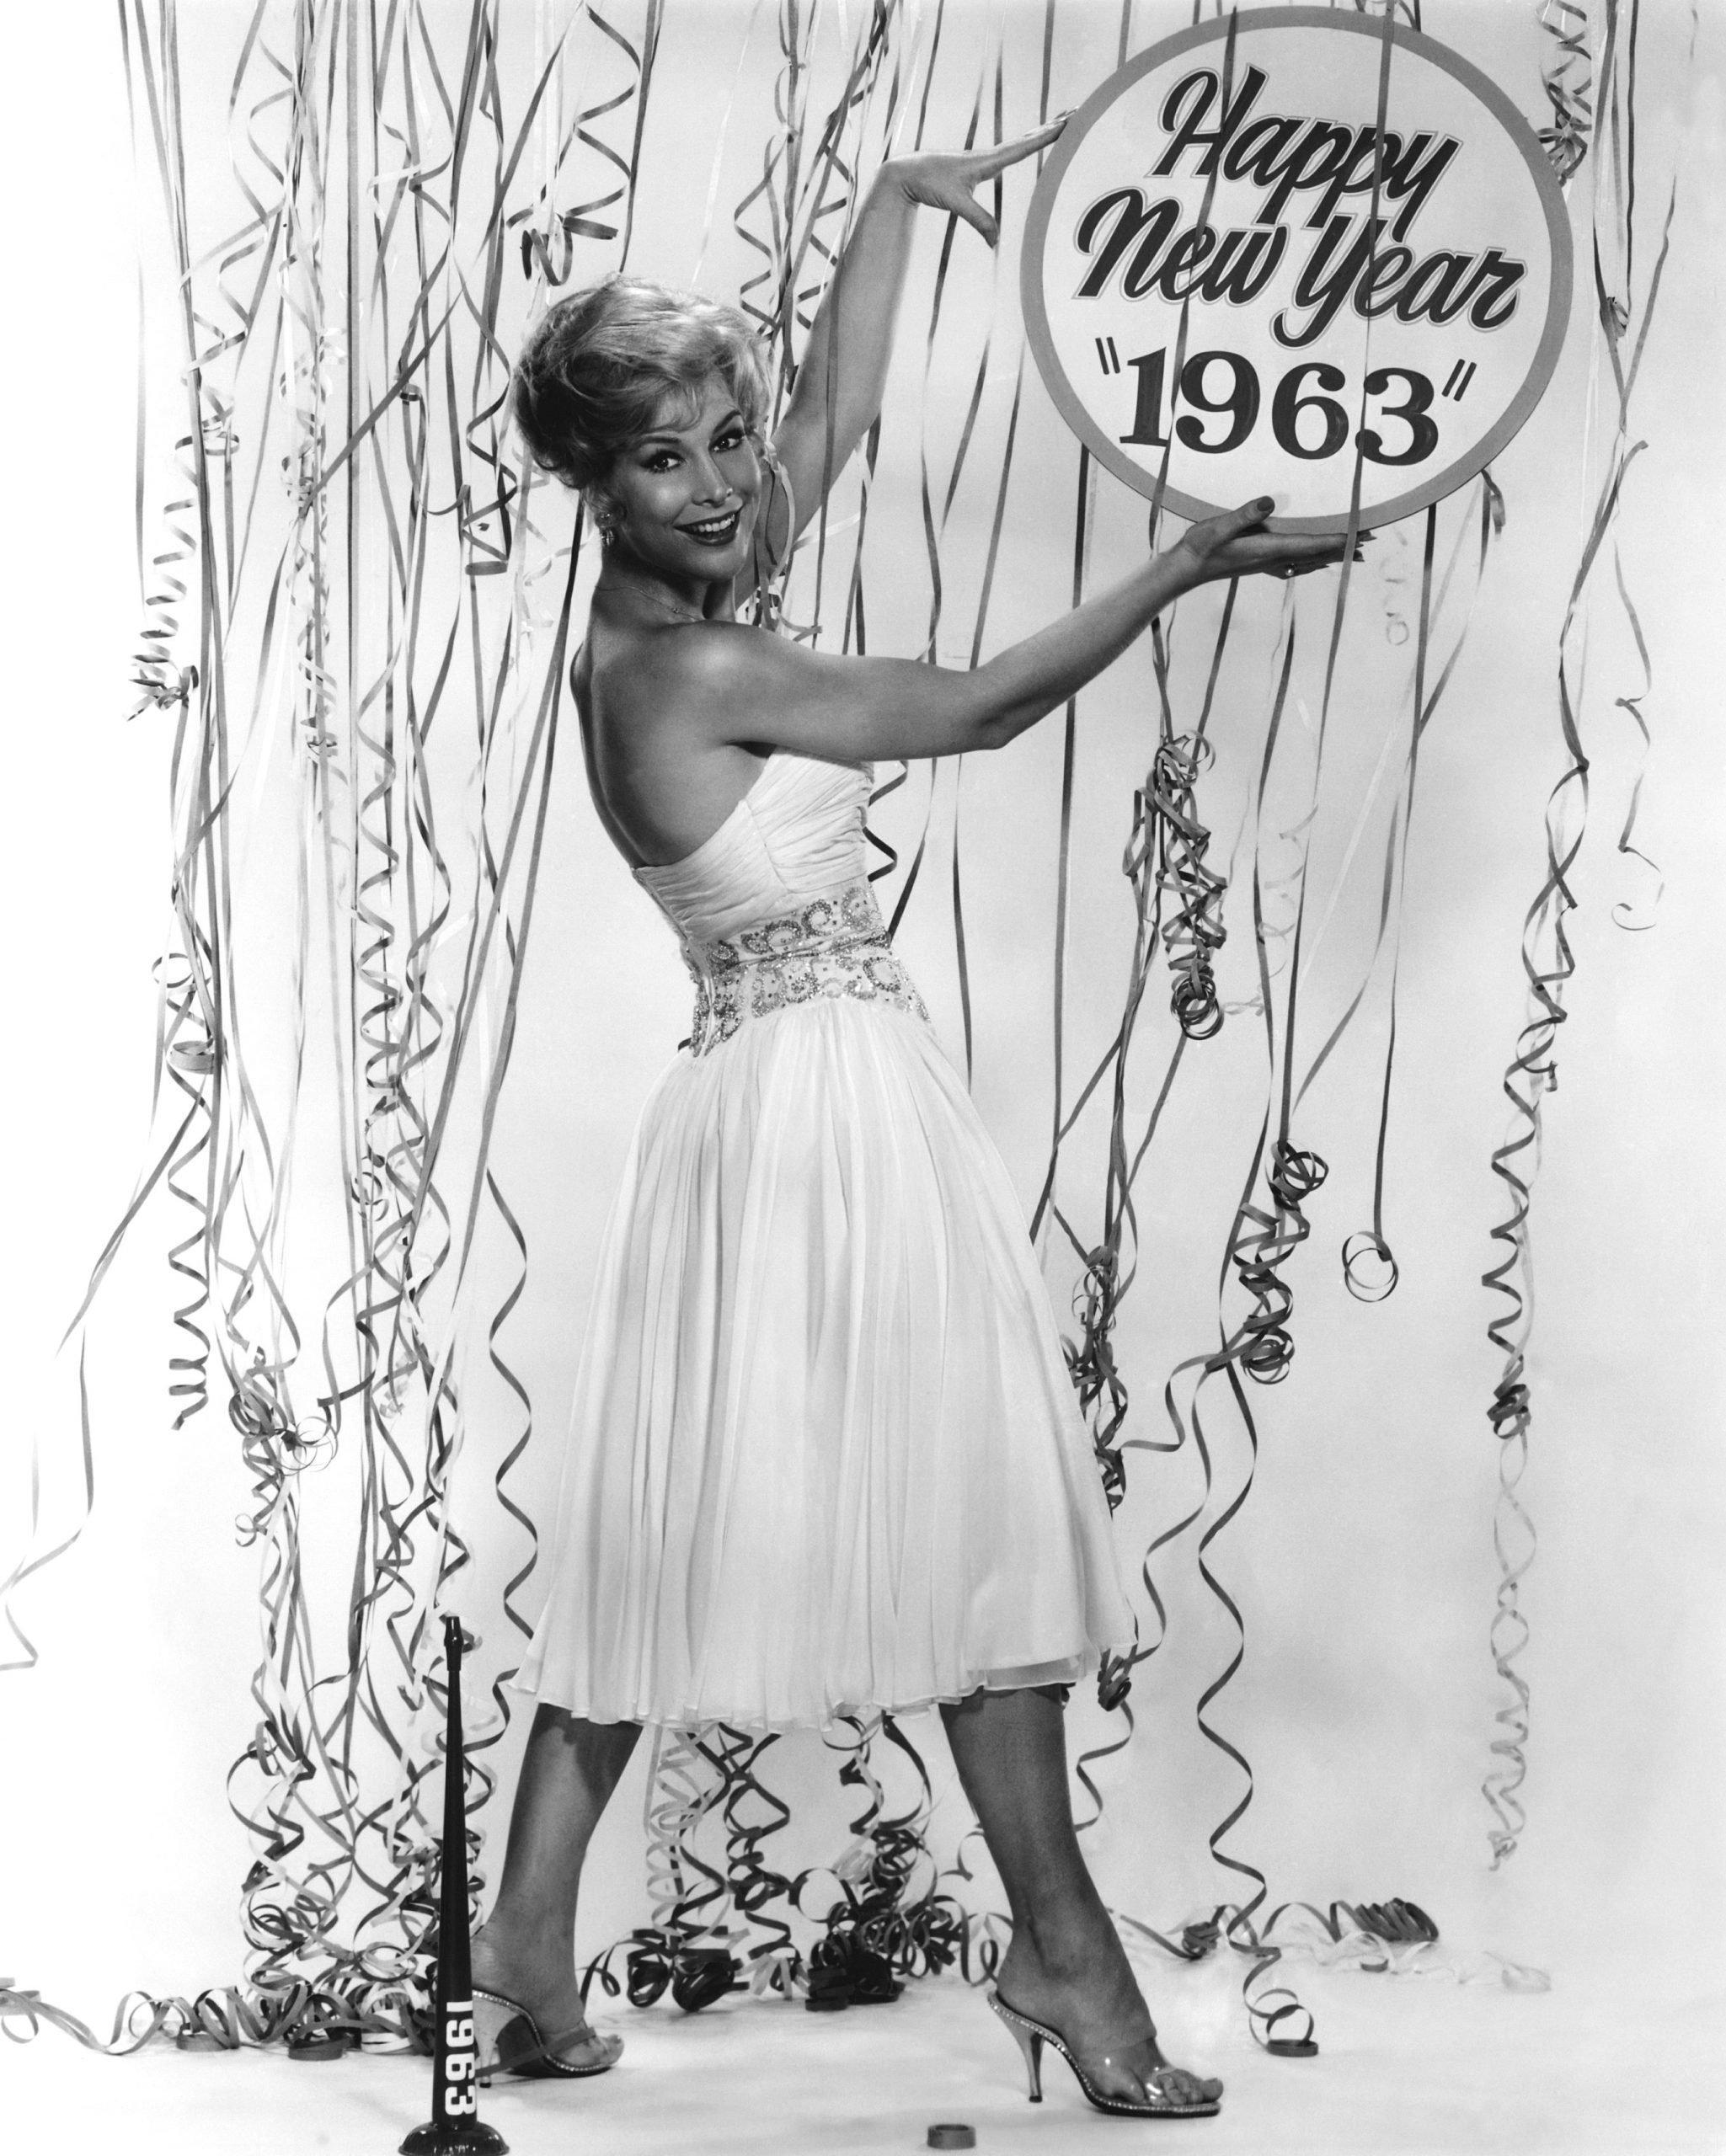 barbara-eden-1963-new-years